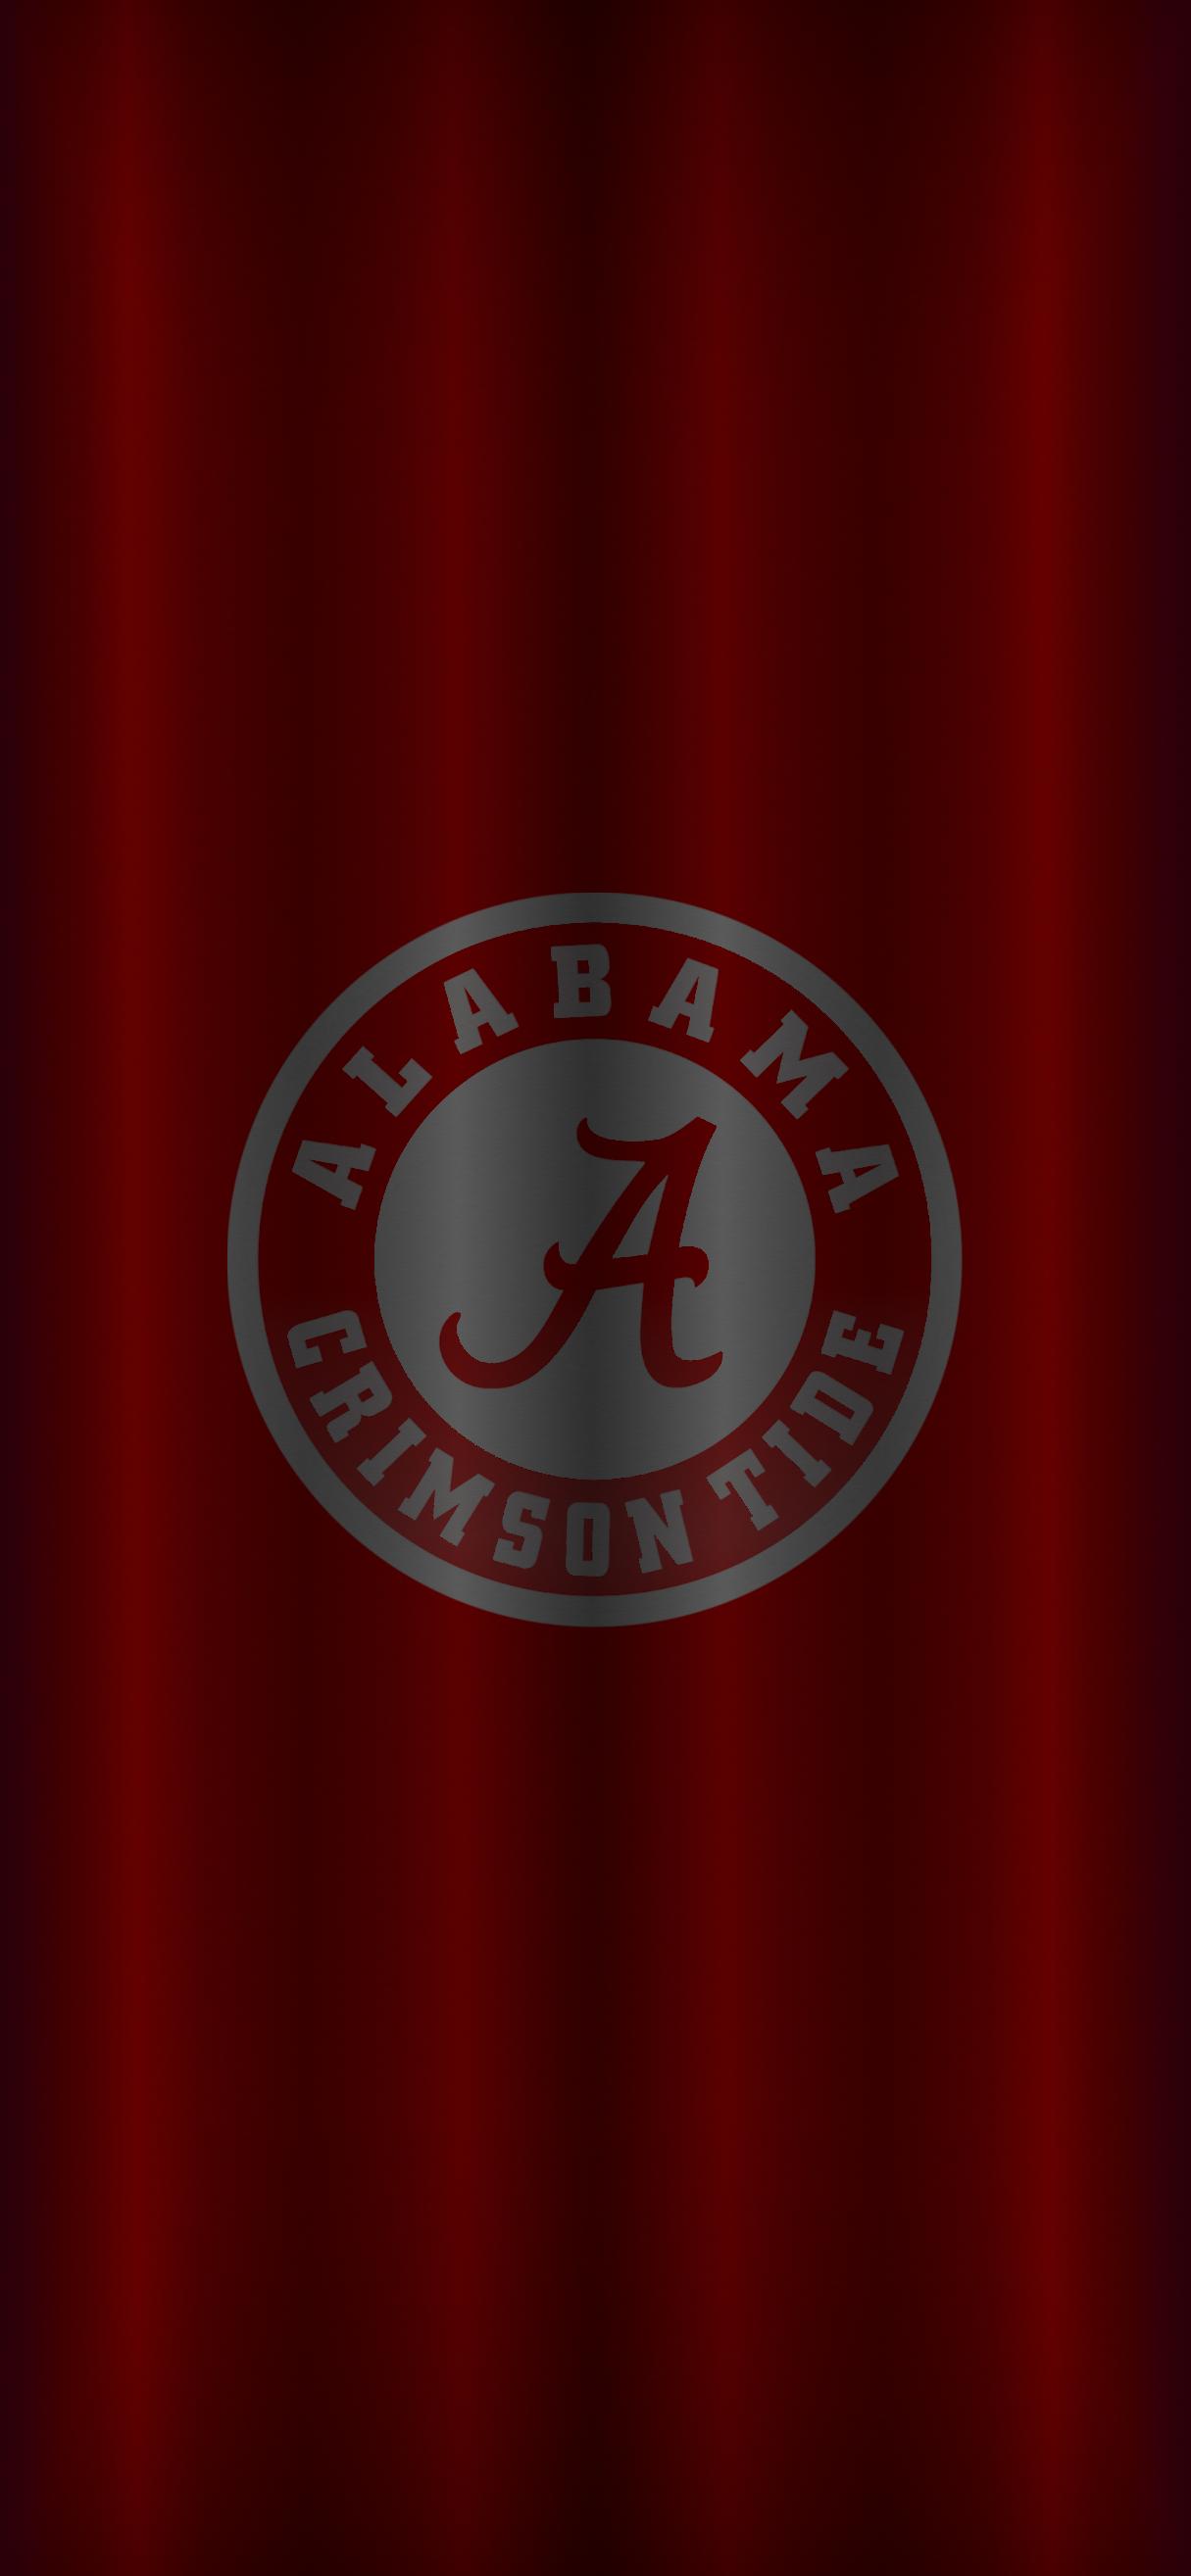 Alabama Crimson Tide Football logo iPhone wallpaper in